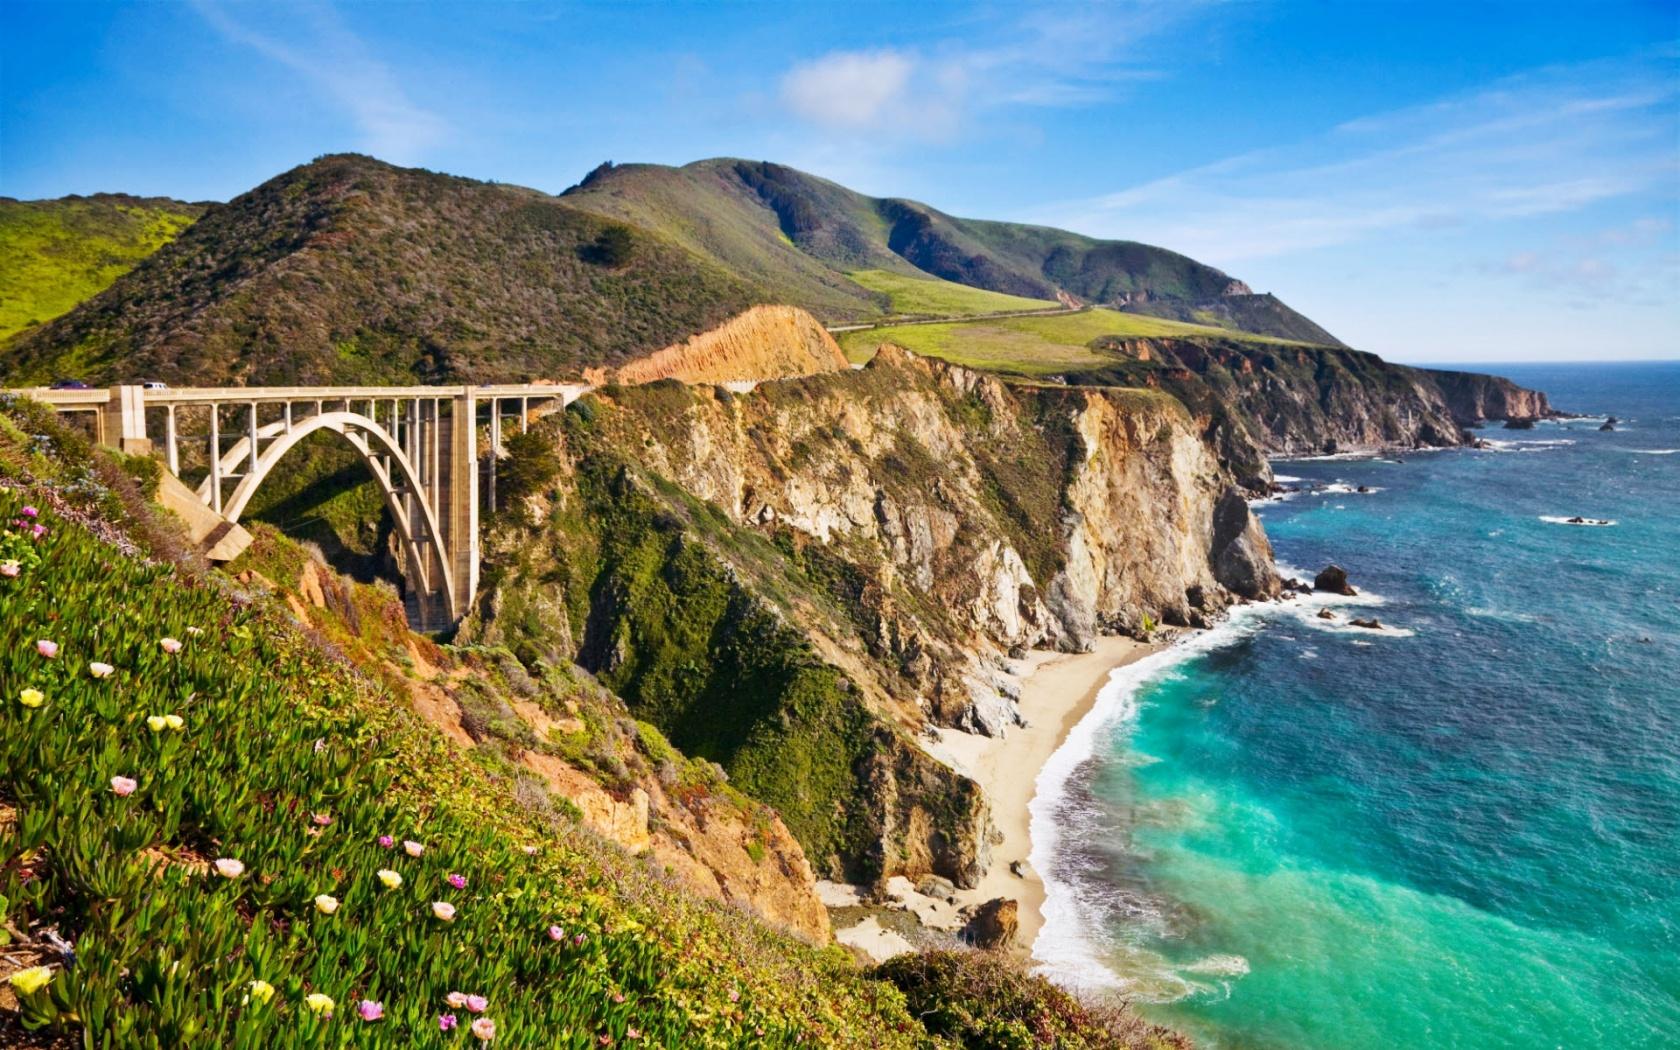 bixby bridge in big sur california wallpapers in jpg format for free